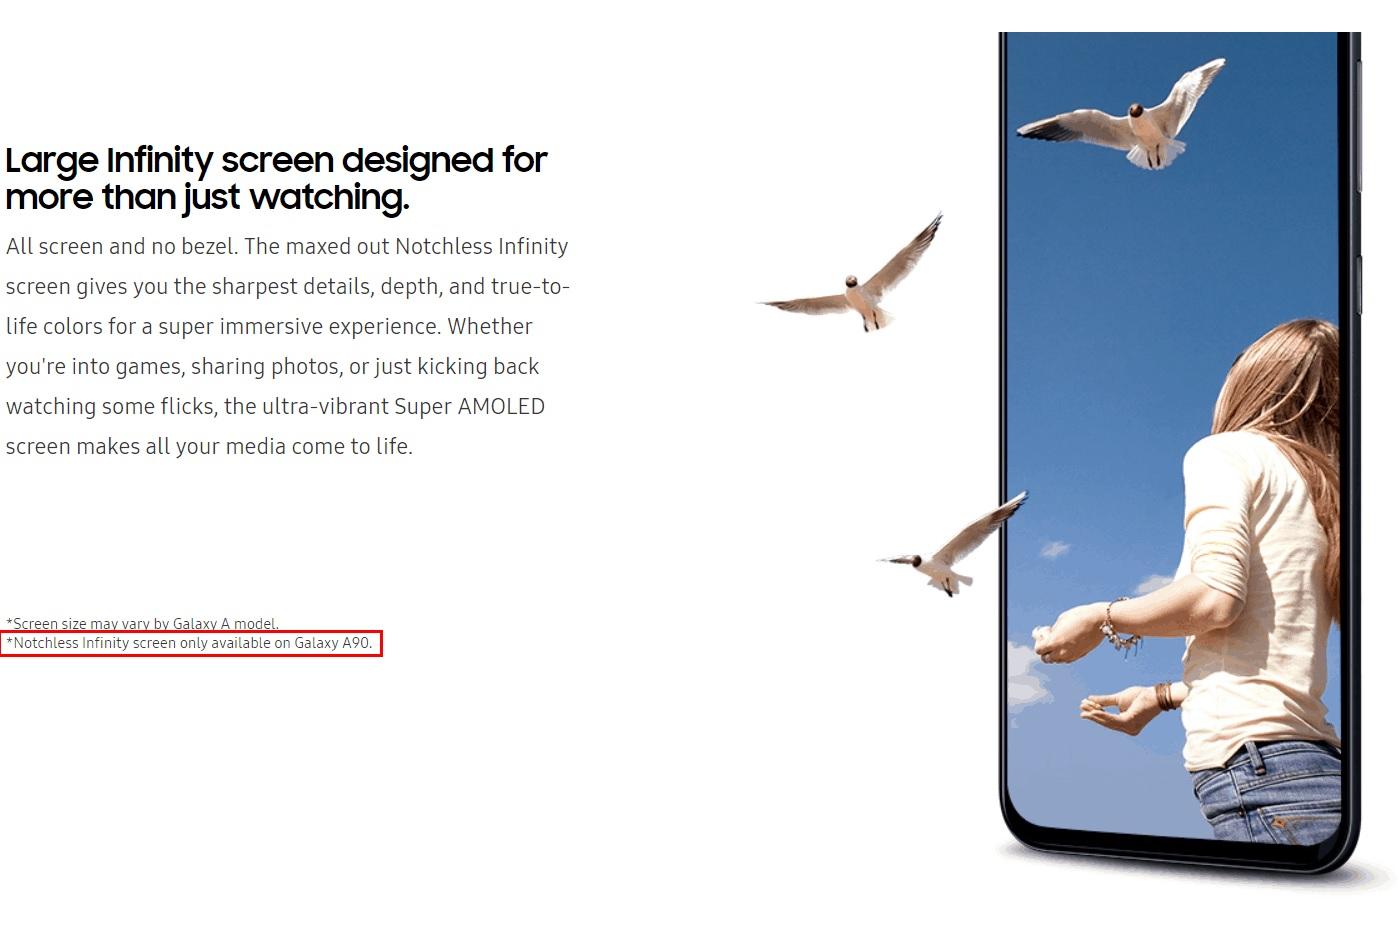 Samsung Galaxy A90 : le design « Notchless Infinity » se précise